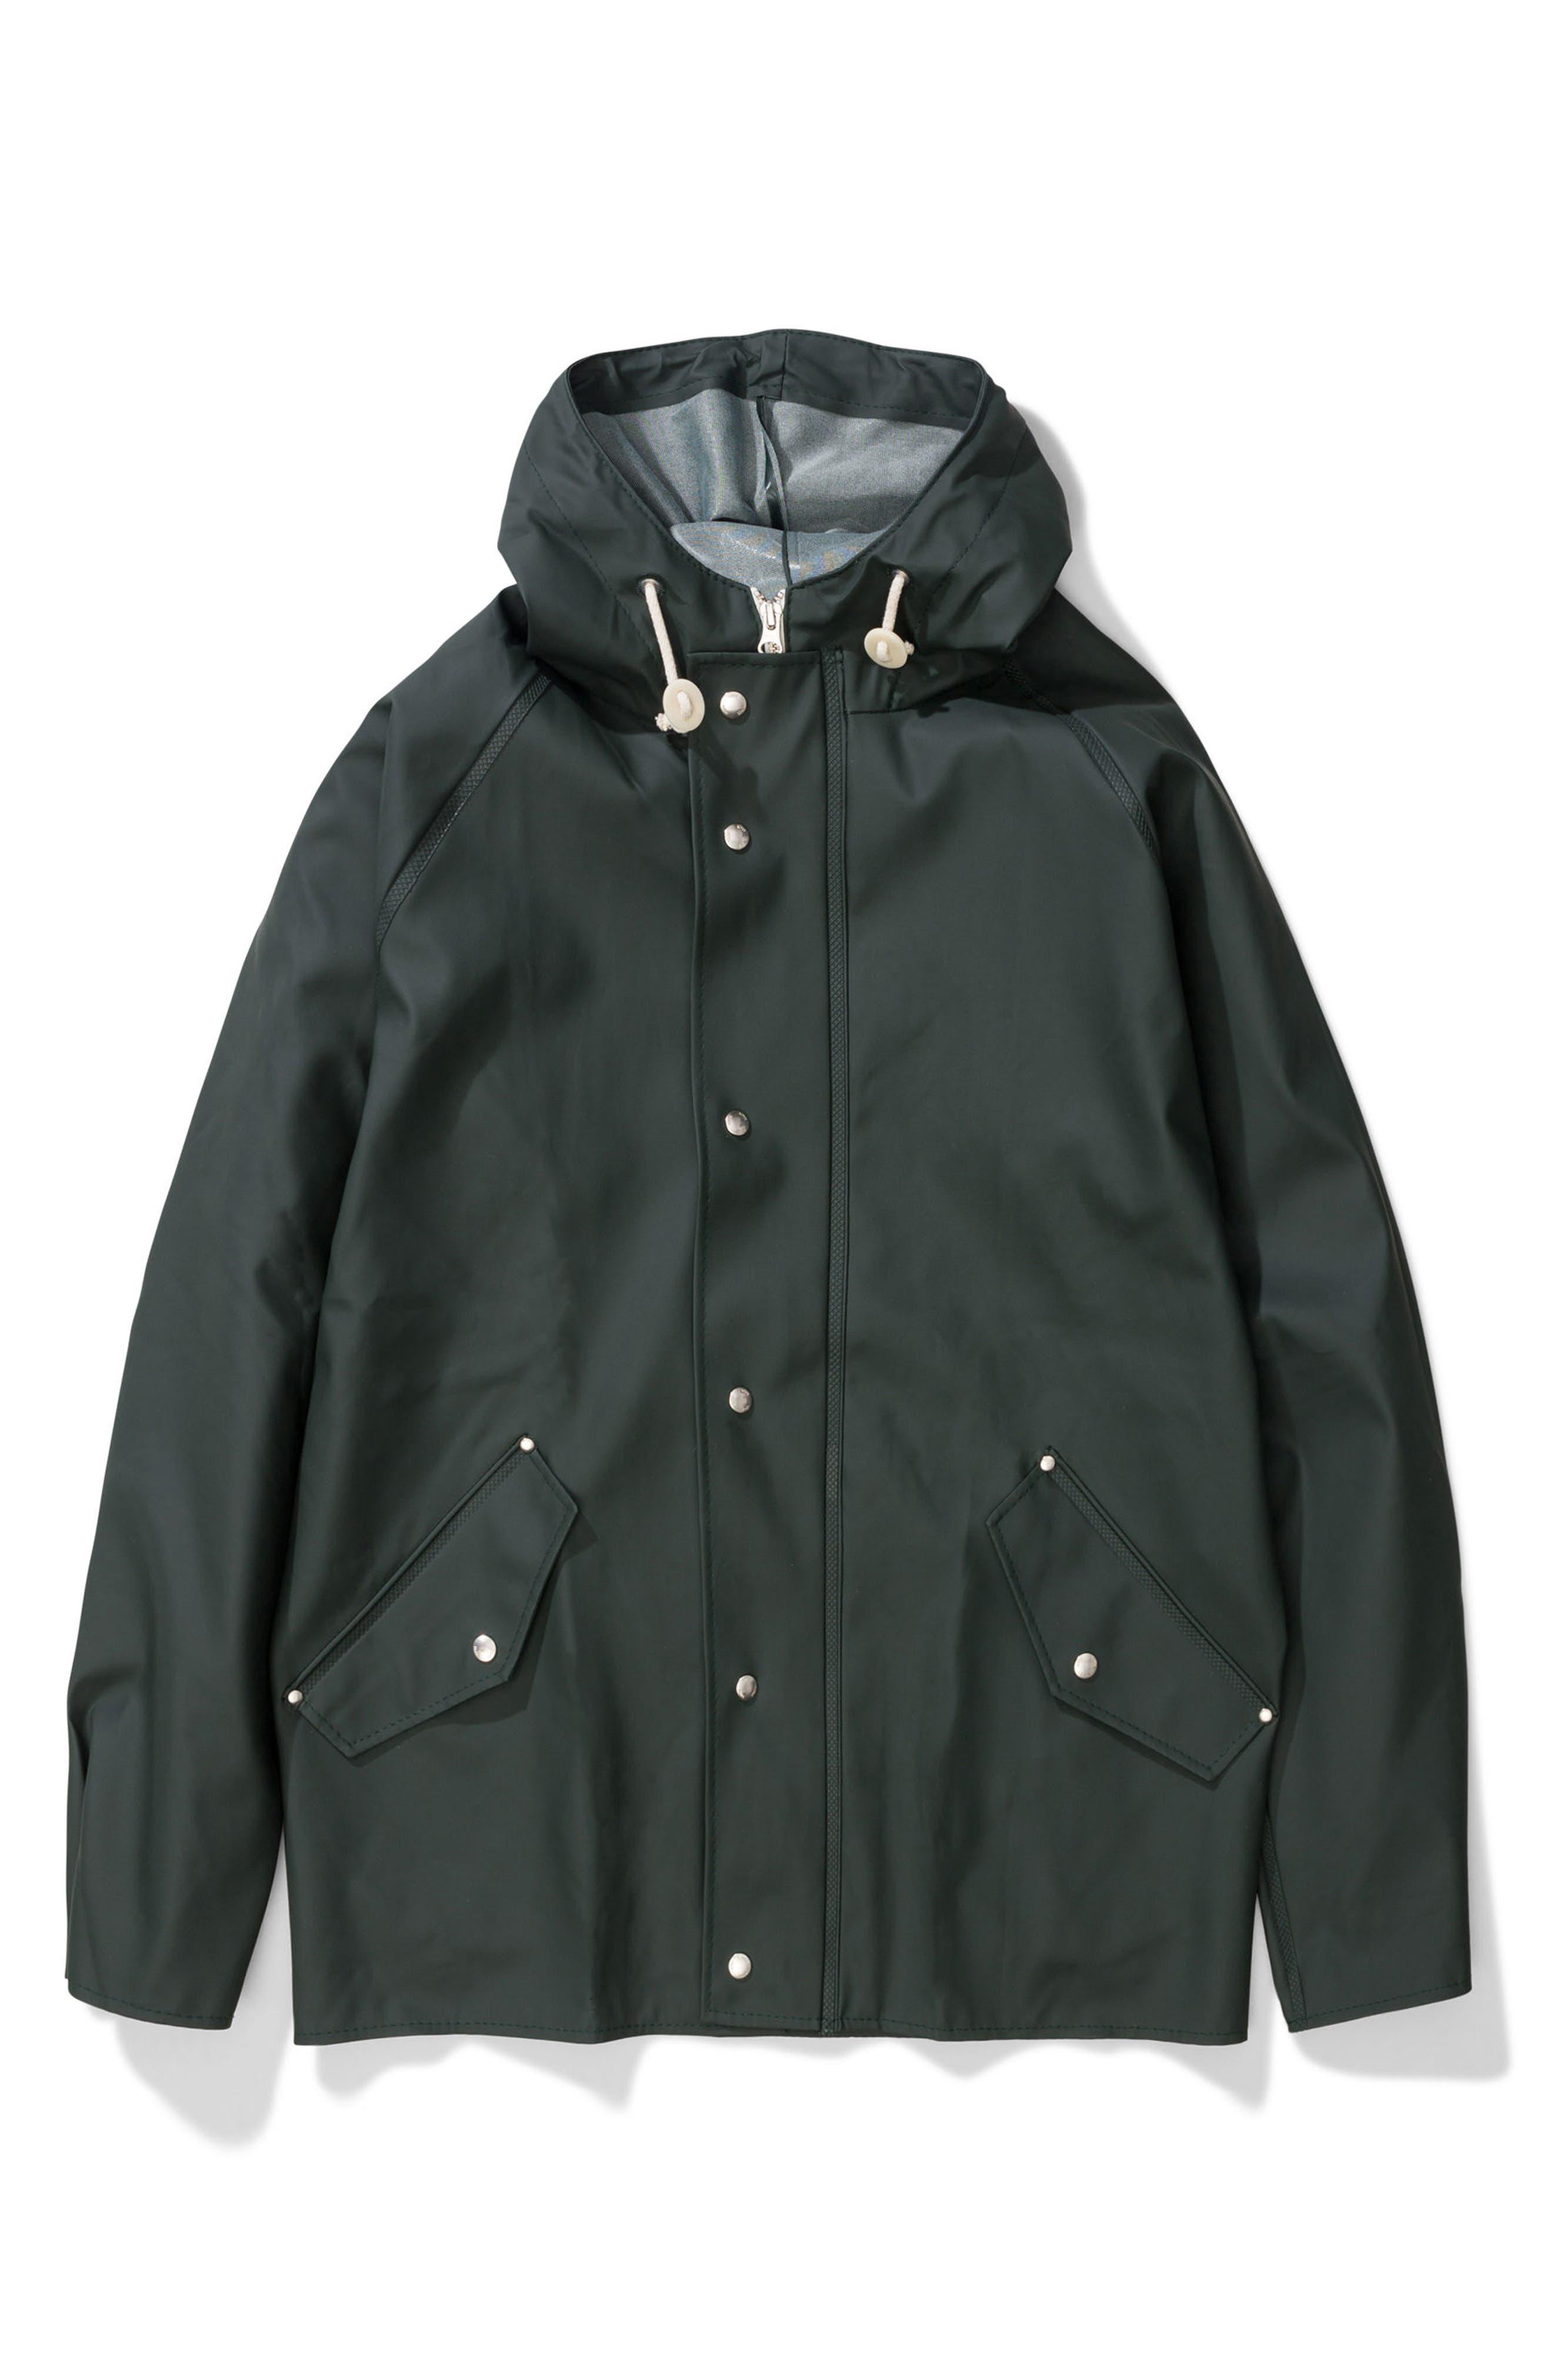 Waterproof Rain Jacket,                             Alternate thumbnail 12, color,                             Moss